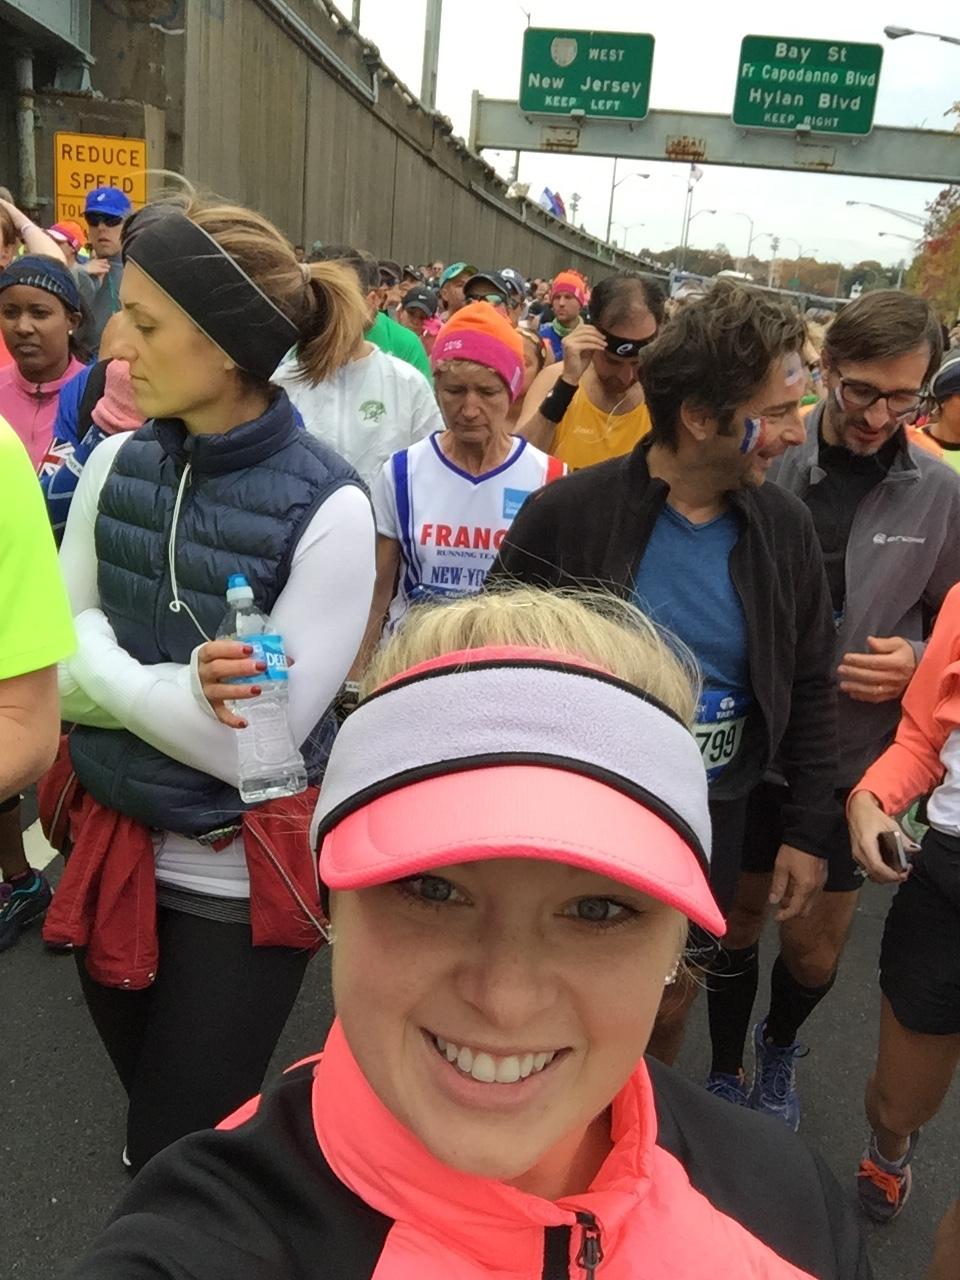 At the start line all bundled up!